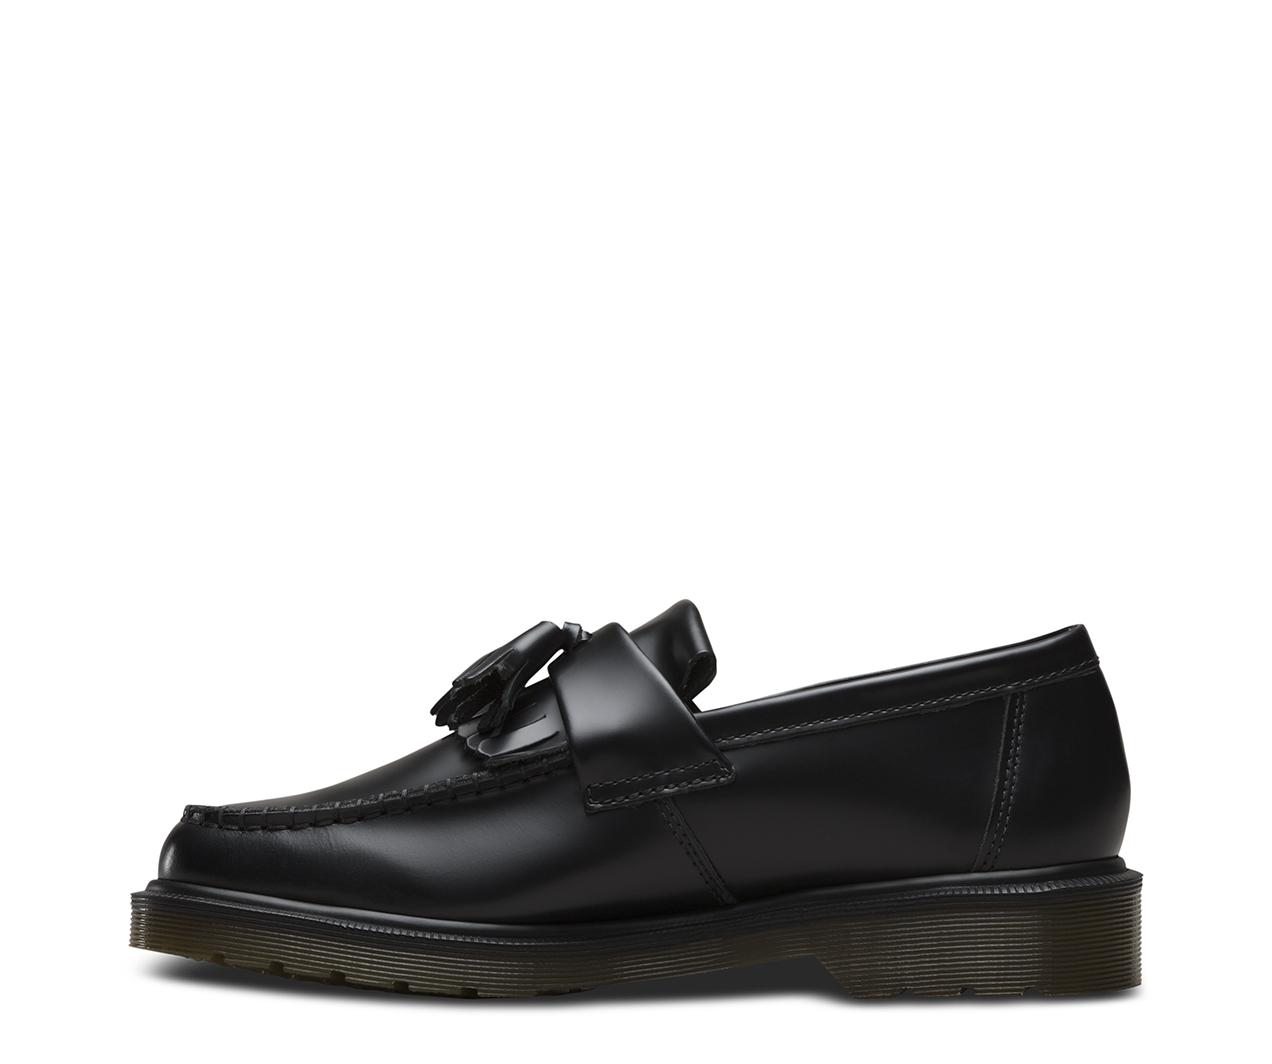 Loafers For Women On Sale, Black, Leather, 2017, 37 38 39 40 Dr. Mocassins Pour Femmes En Vente, Noir, Cuir, 2017, 37 38 39 40 Dr. Martens Martens